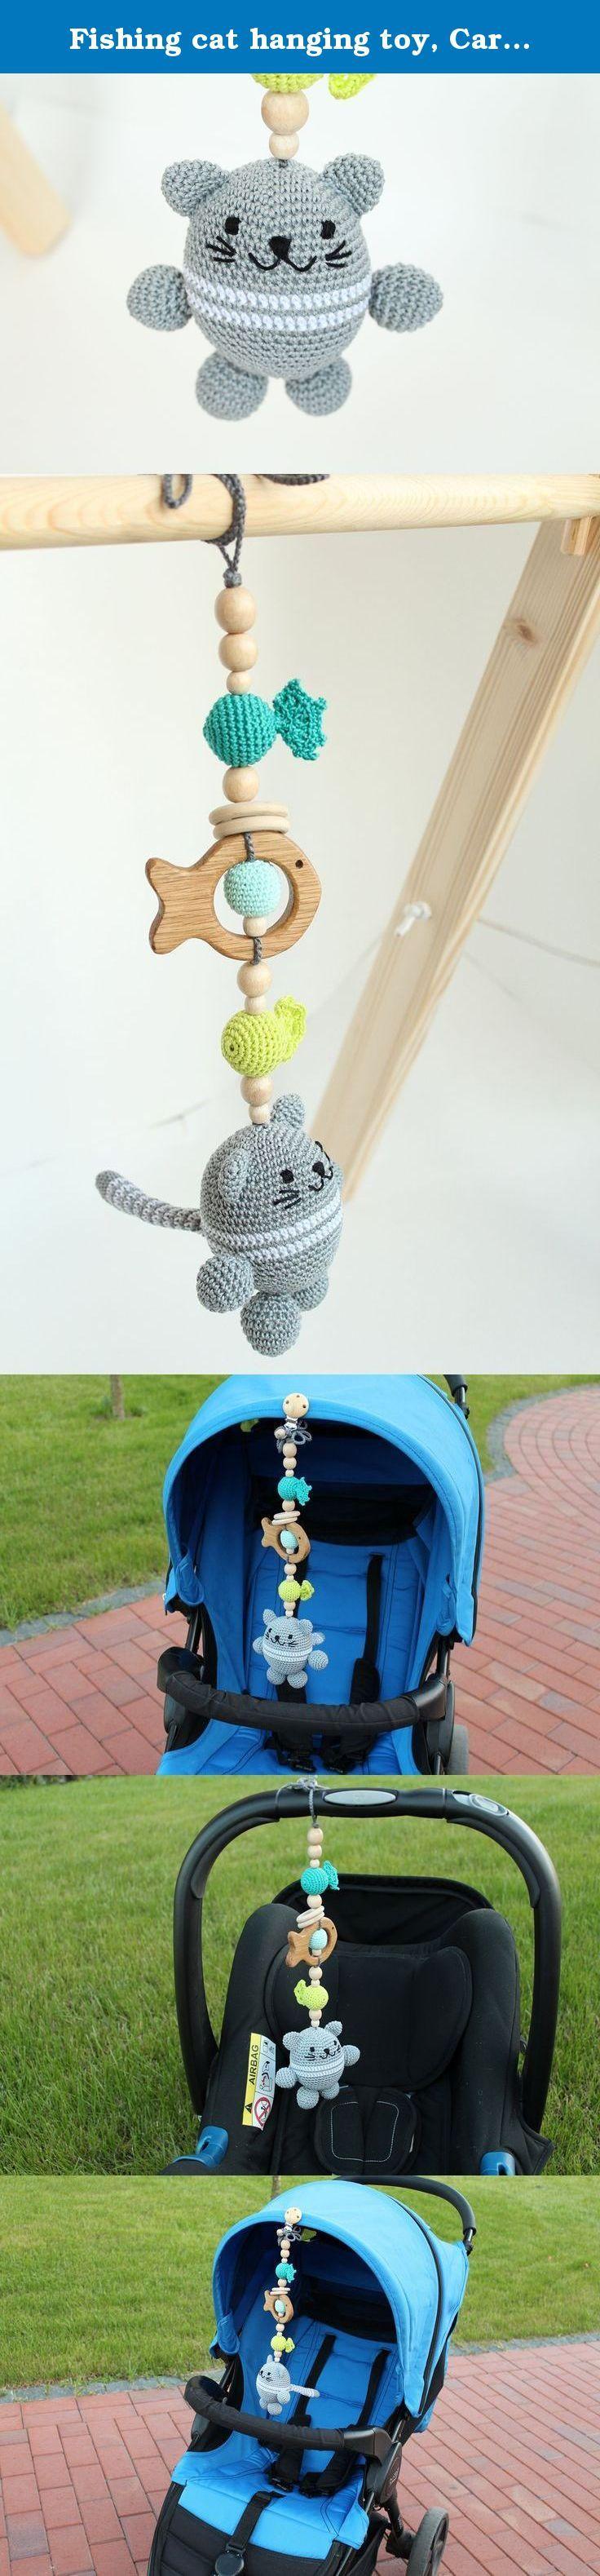 Best crib toys your baby - Fishing Cat Hanging Toy Car Seat Toy Pram Toy Stroller Toy Crib